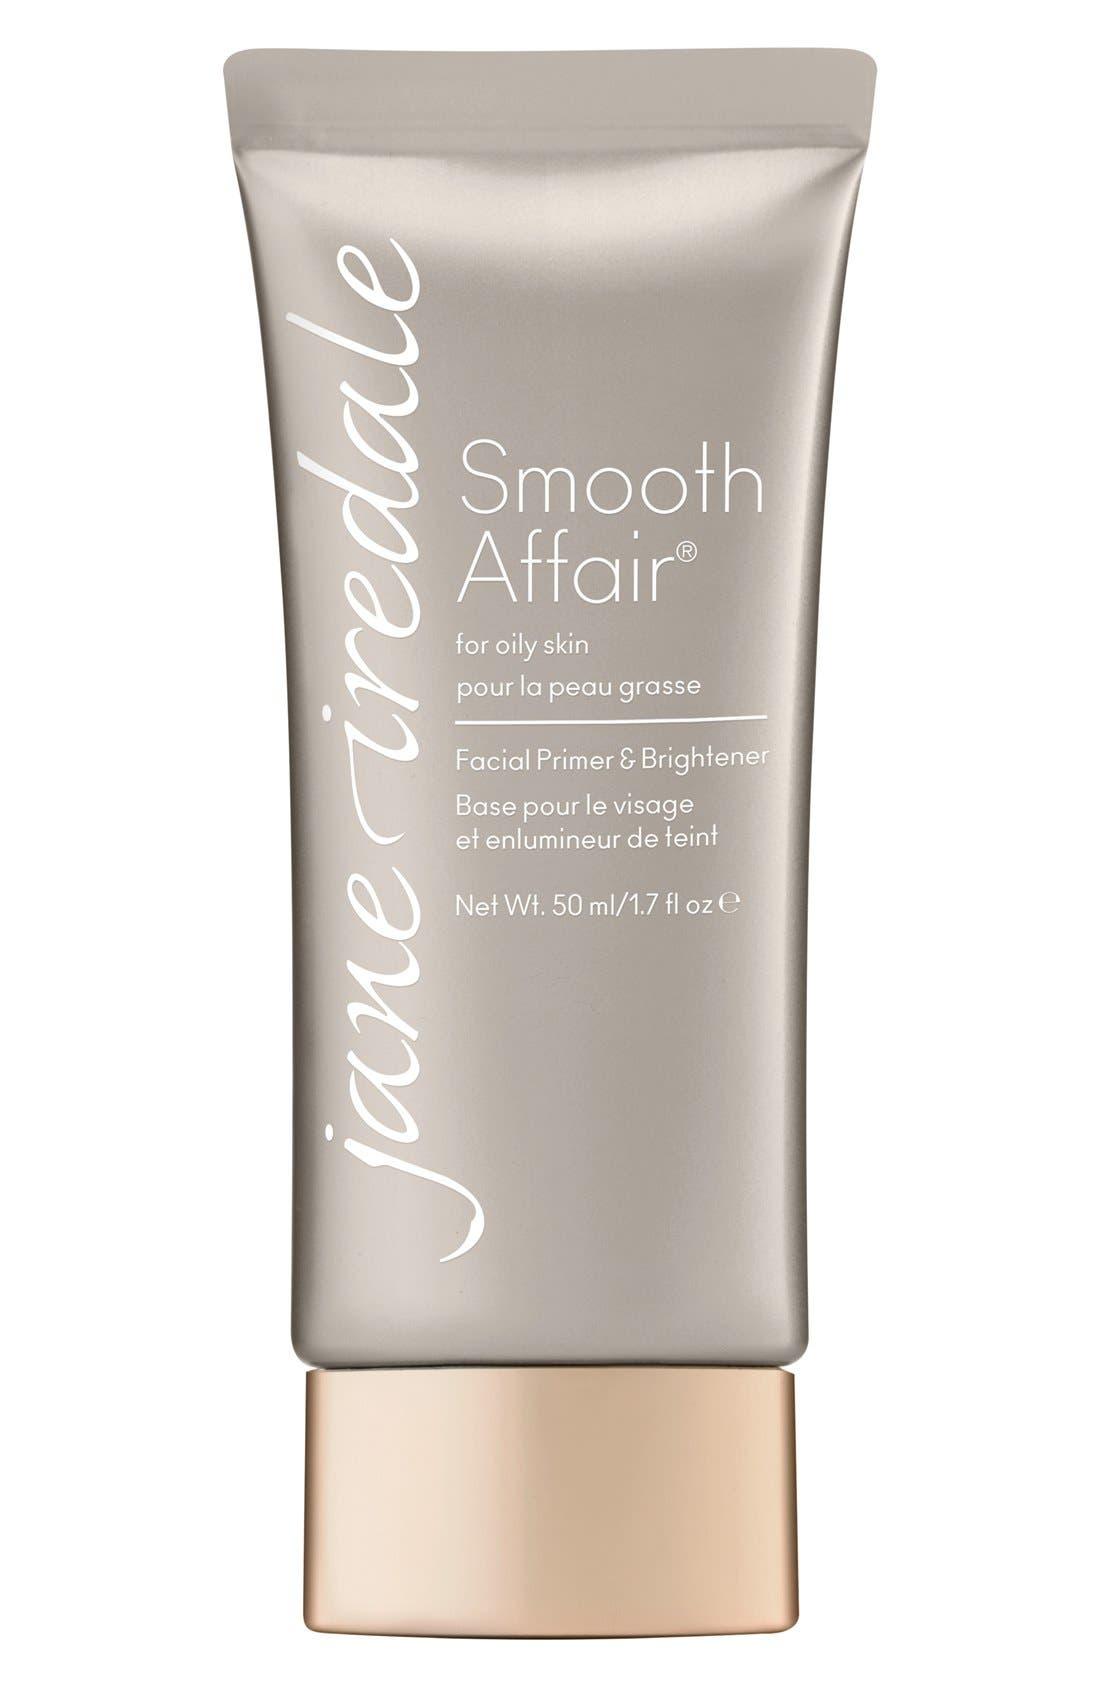 jane iredale Smooth Affair™ Facial Primer & Brightener for Oily Skin